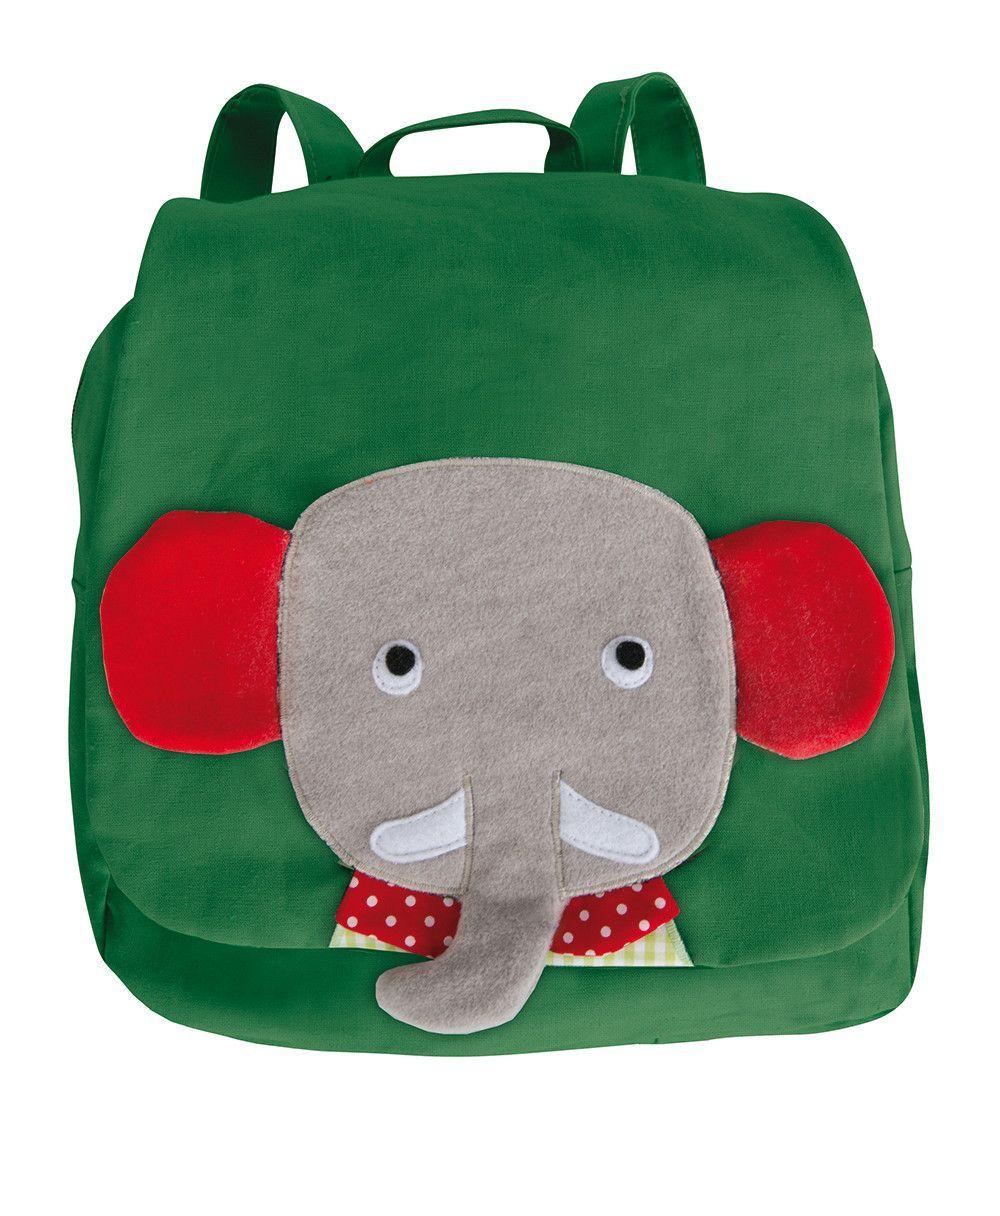 Elephant backpack plus others